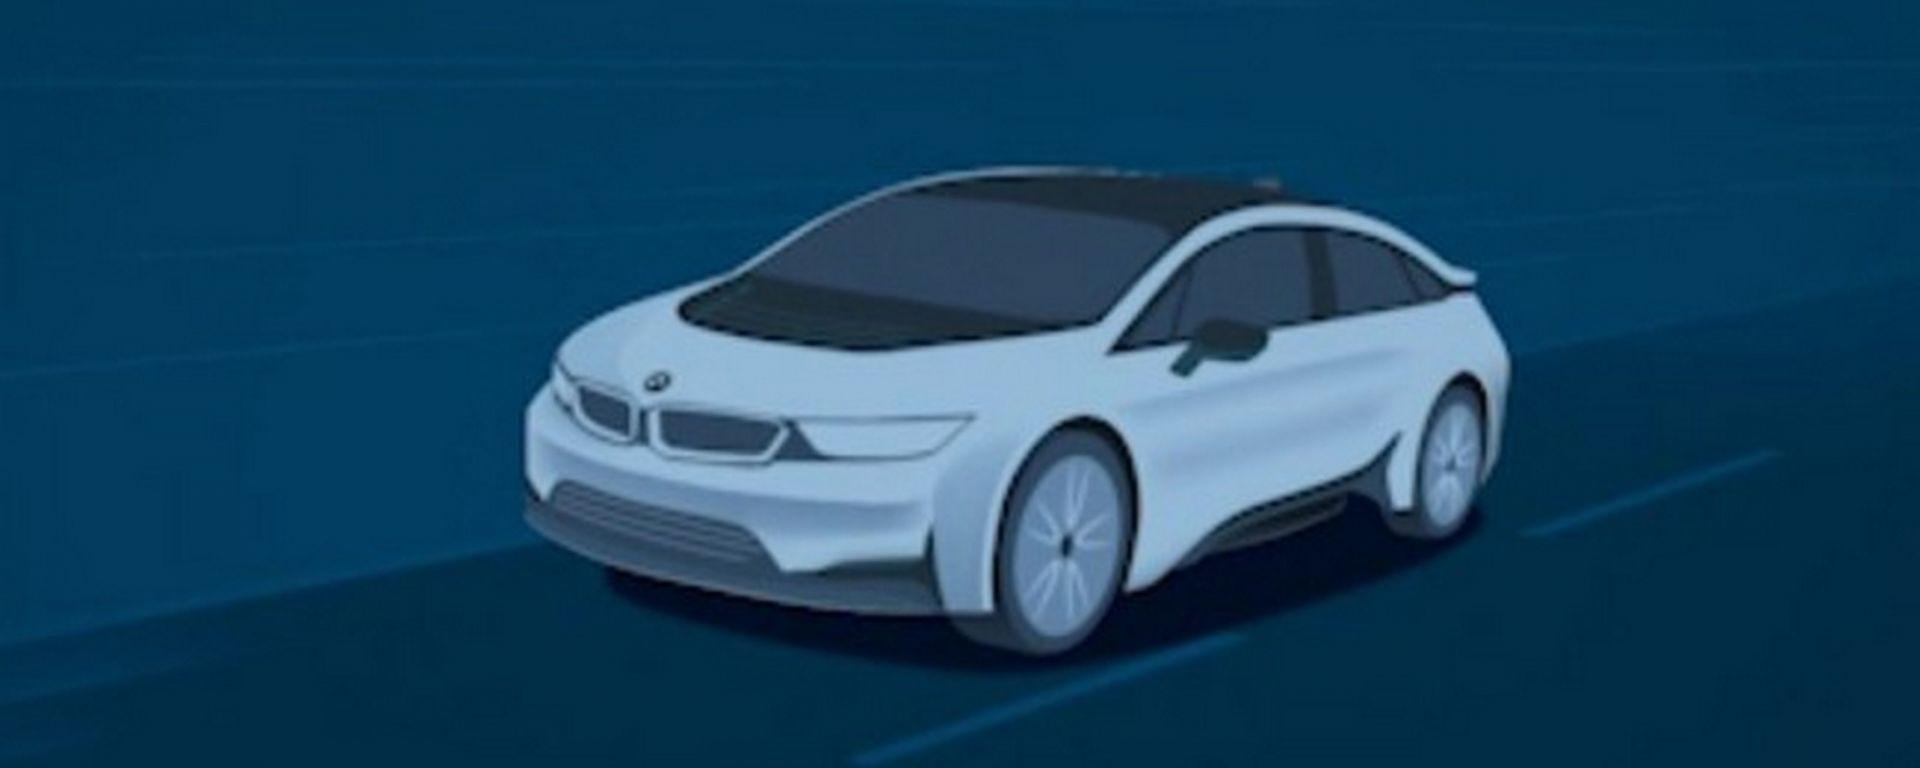 BMW i5, il teaser